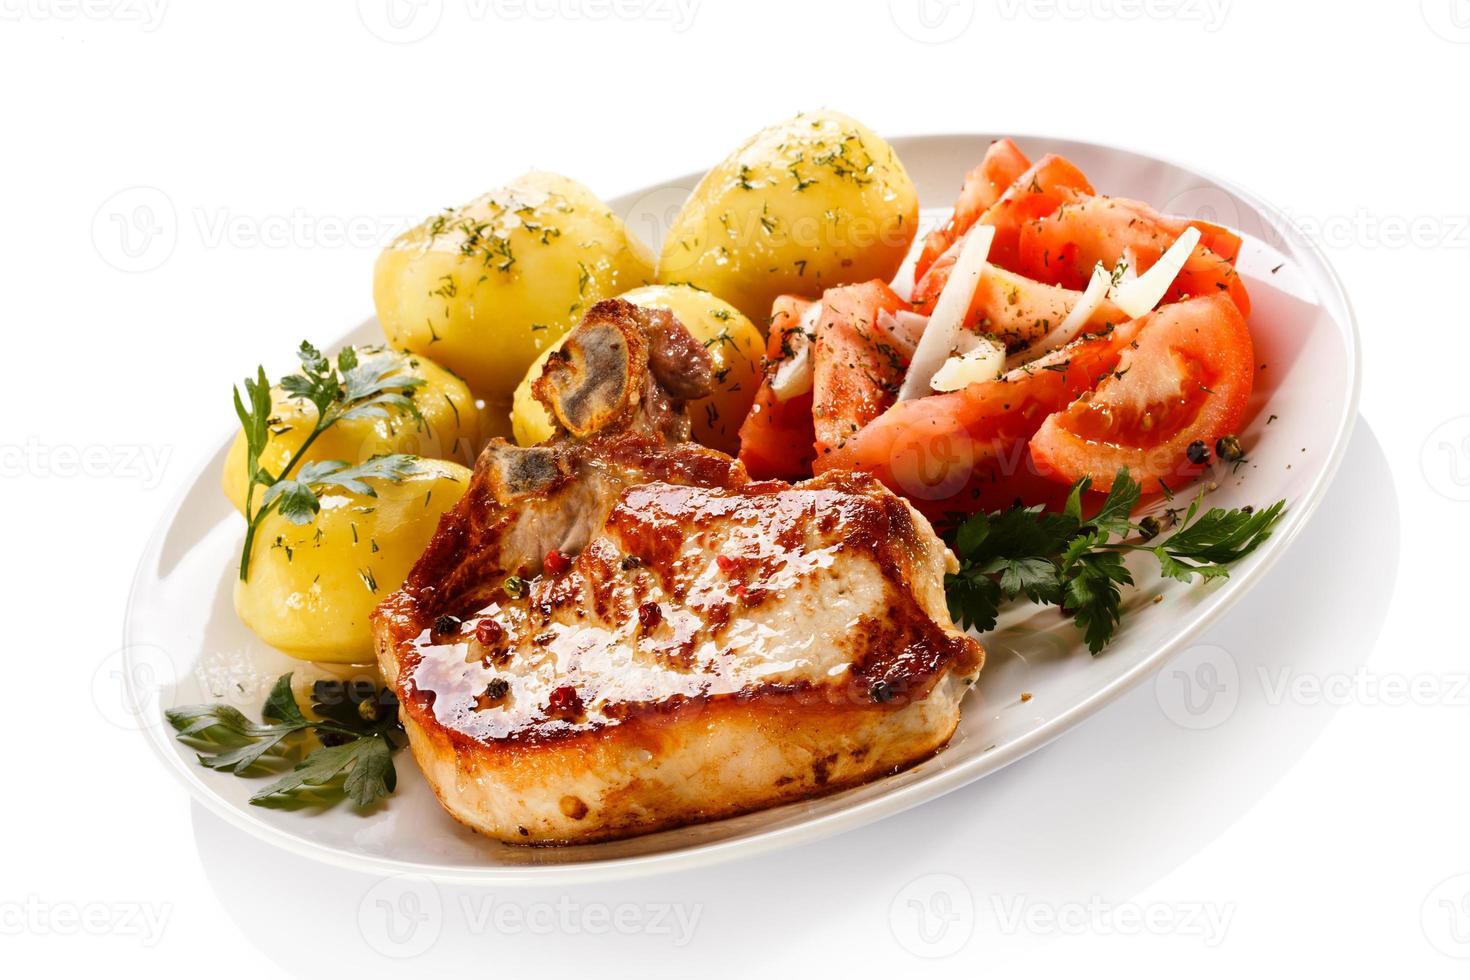 Chuleta de cerdo, patatas hervidas y verduras sobre fondo blanco. foto